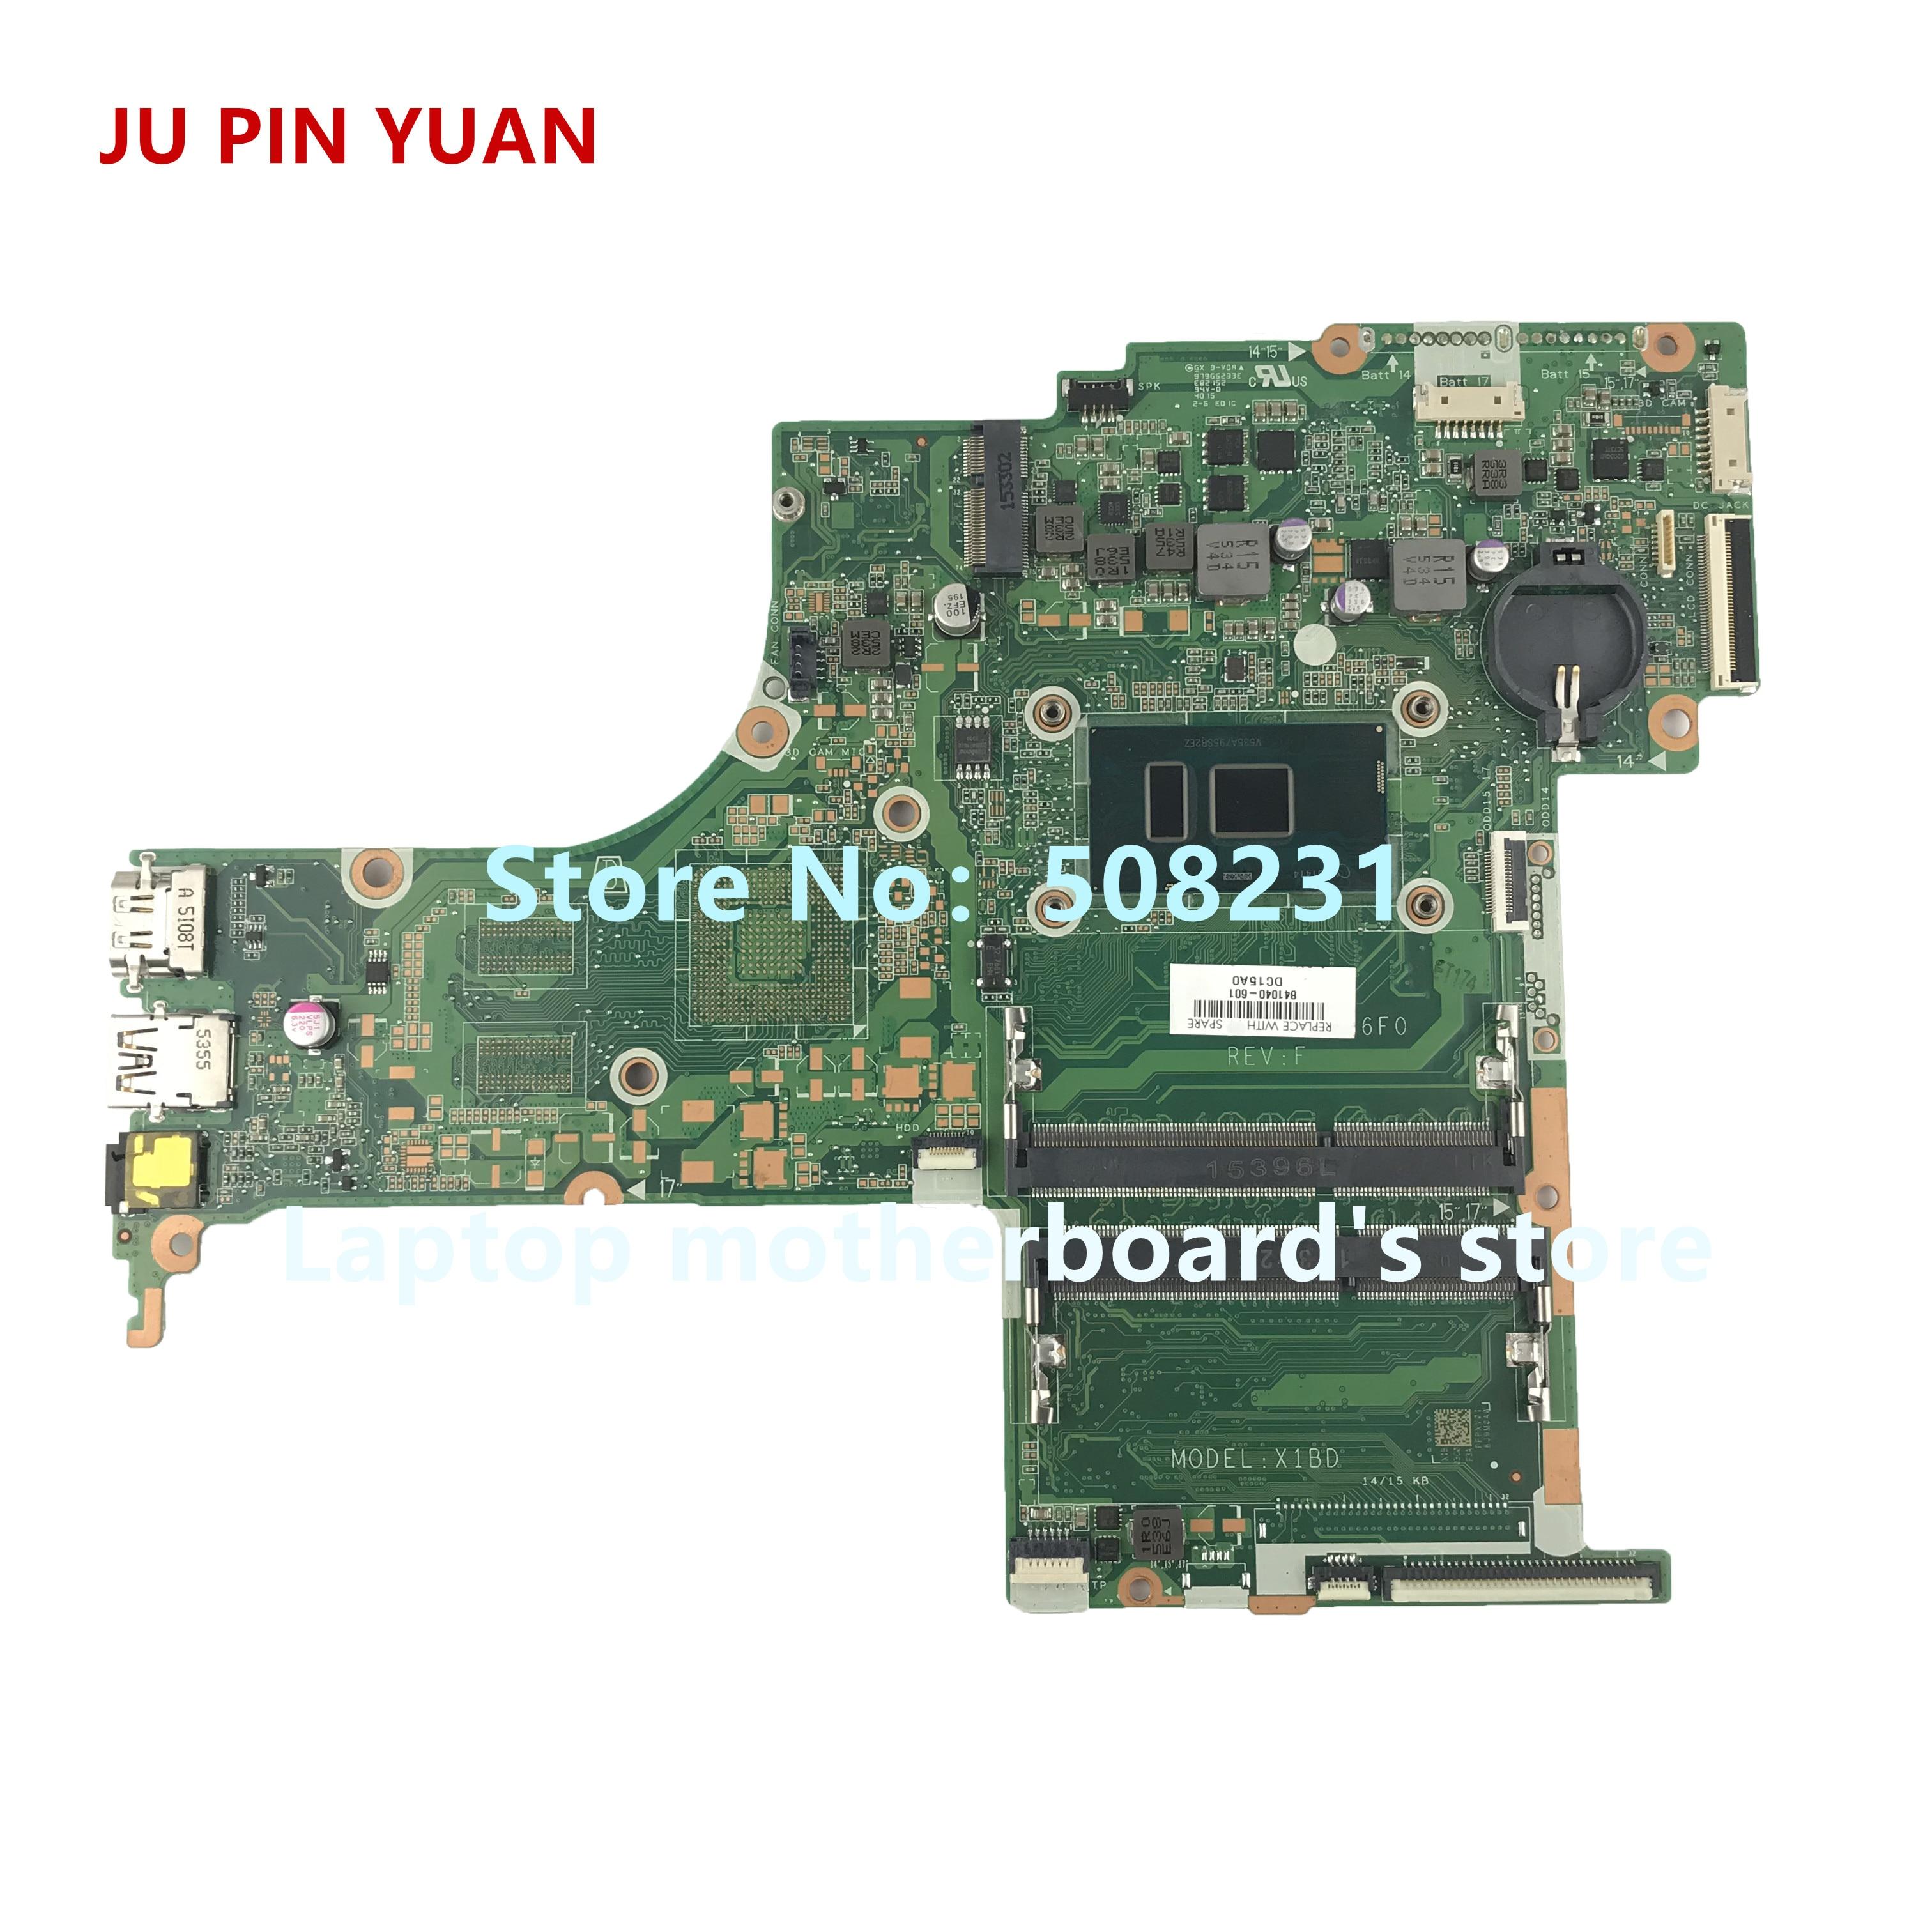 JU PIN YUAN 841040-601 841040-001 mainboard for HP Pavilion 17-G 17-S 17-S017CL Laptop motherboard DAX1BDMB6F0 X1BD i7-6500uJU PIN YUAN 841040-601 841040-001 mainboard for HP Pavilion 17-G 17-S 17-S017CL Laptop motherboard DAX1BDMB6F0 X1BD i7-6500u